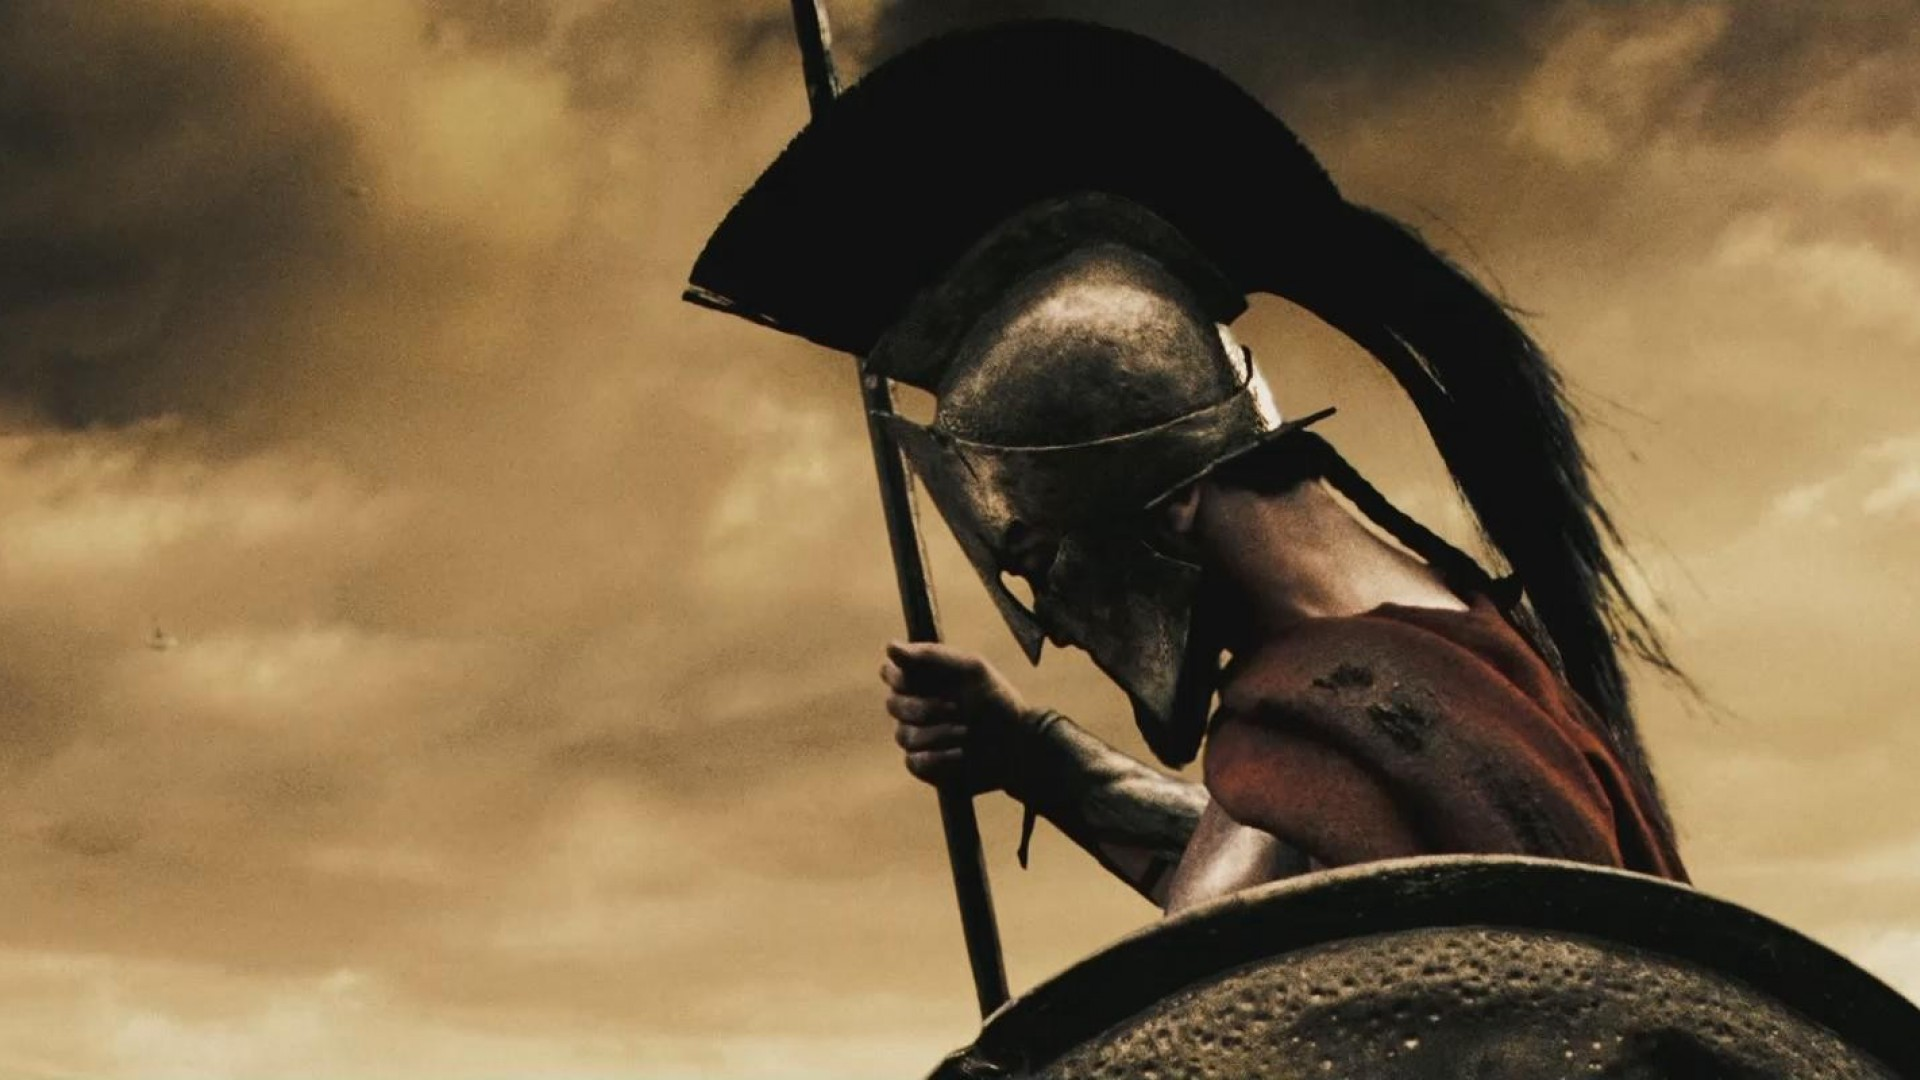 Spartan Wallpaper on Wallpaper Goo 78